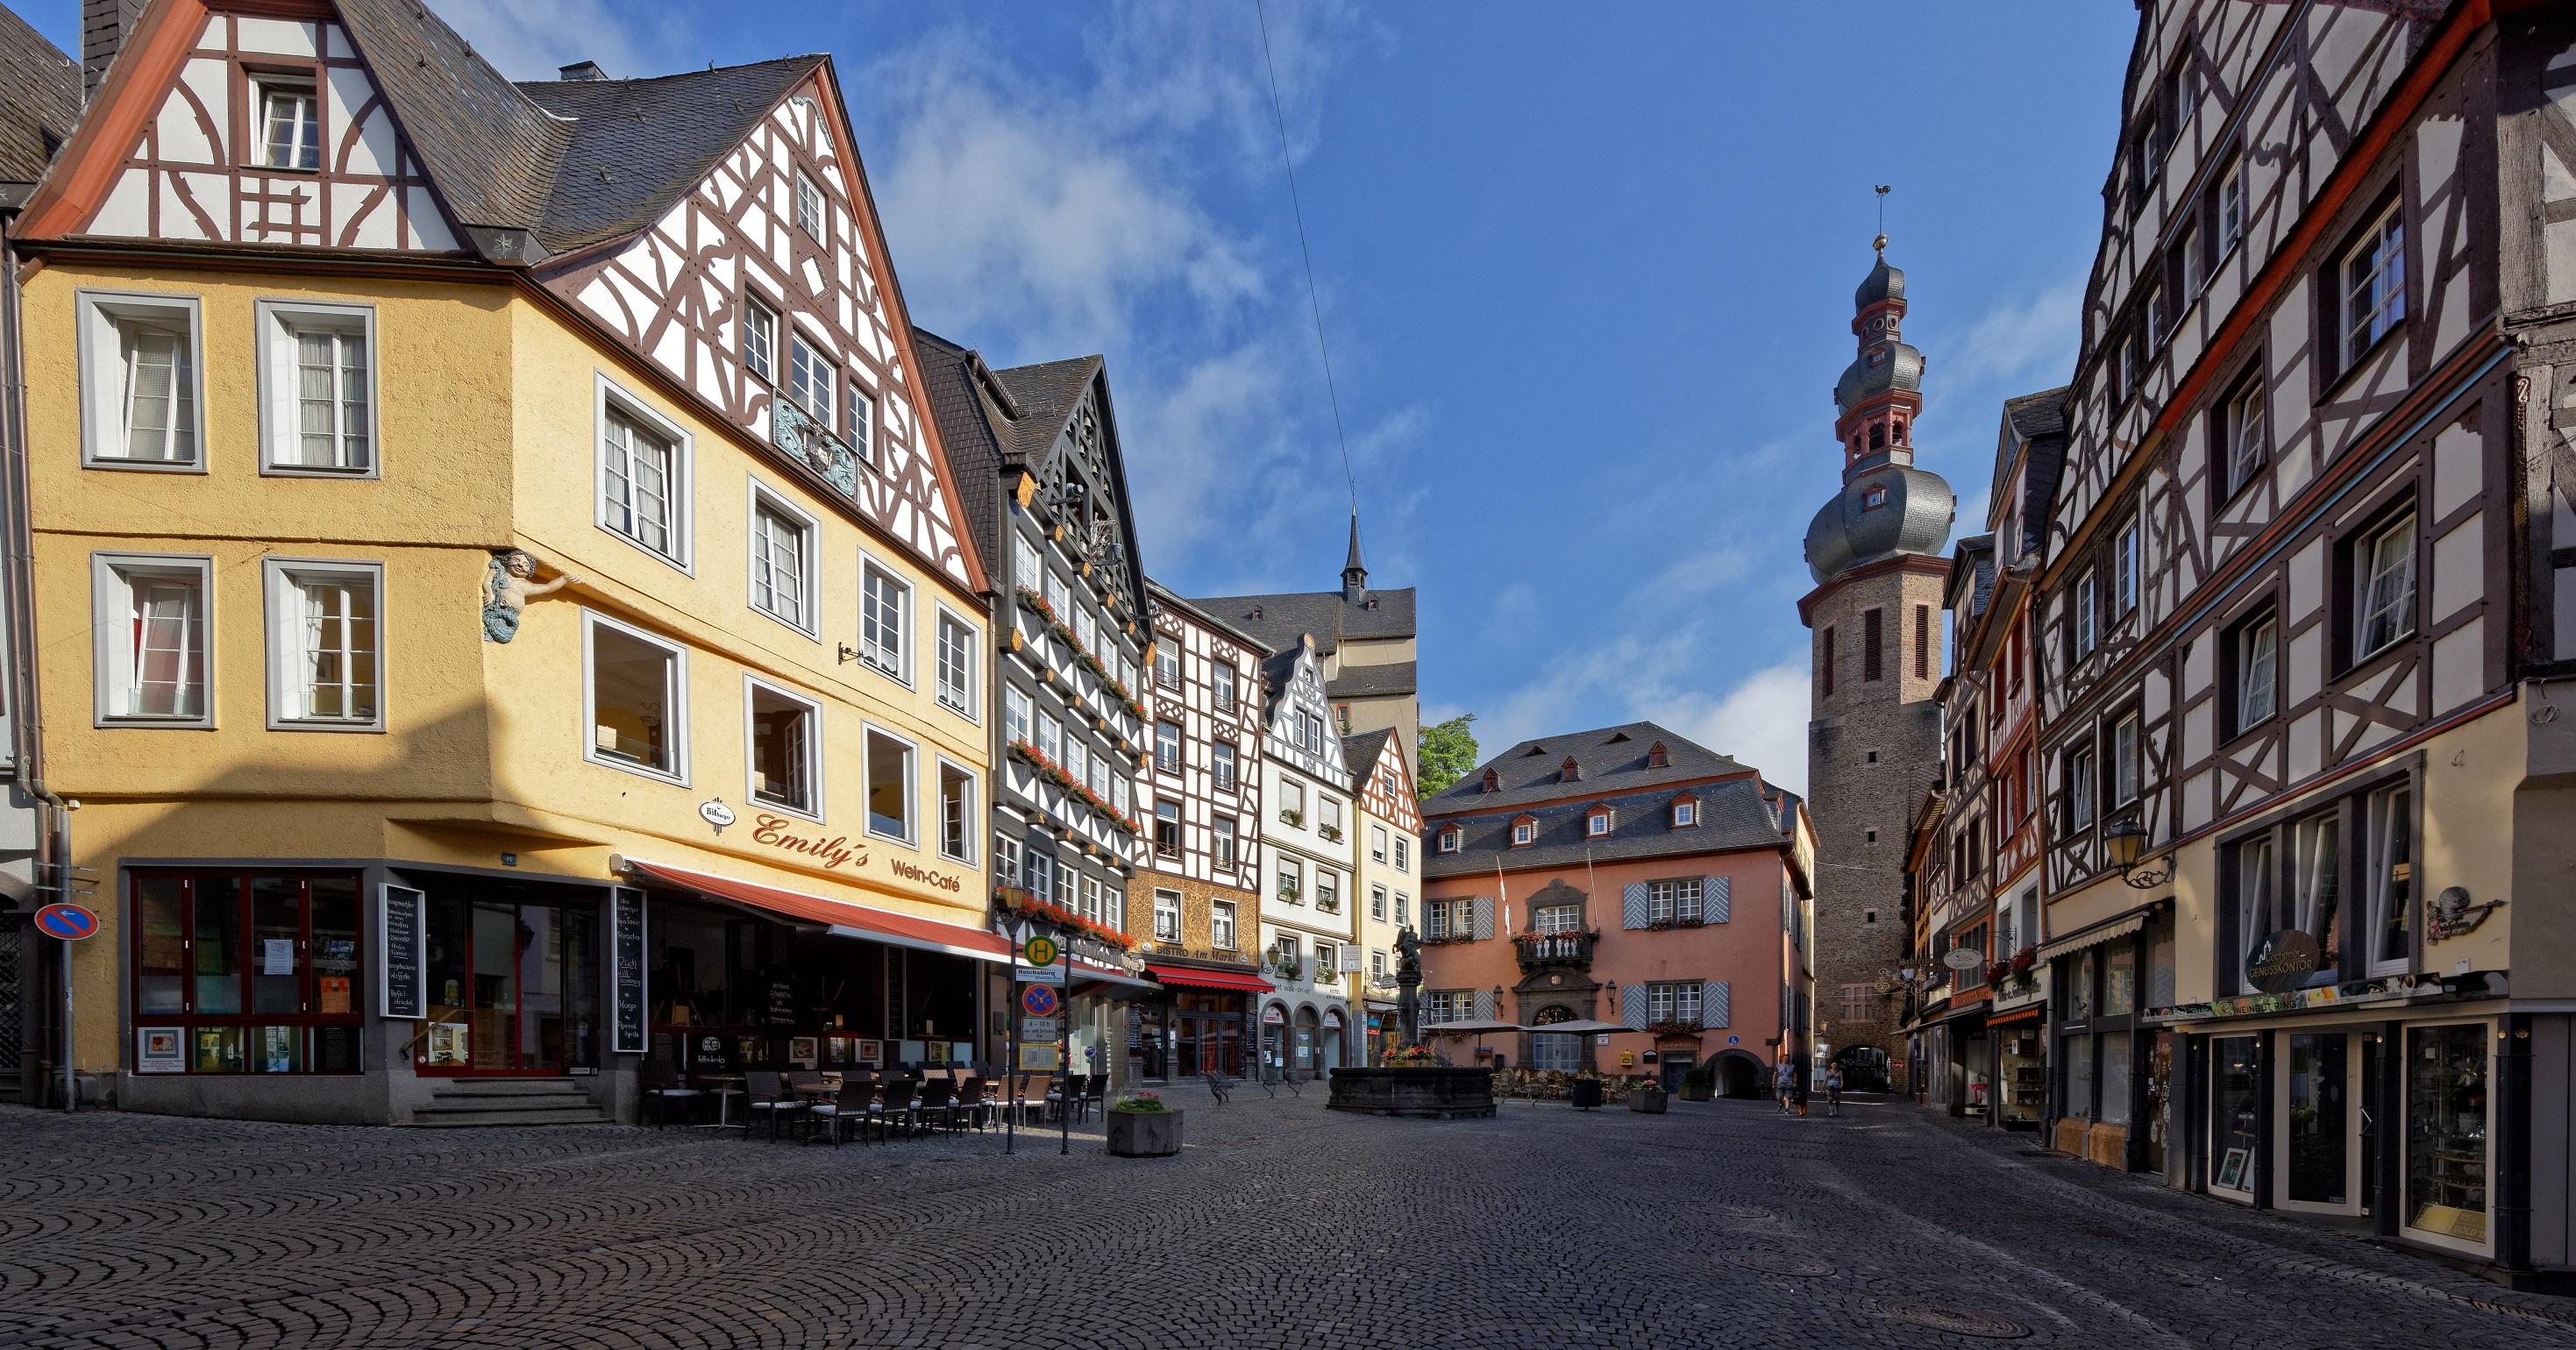 Sonnenblick_Cochem_Mosel_06